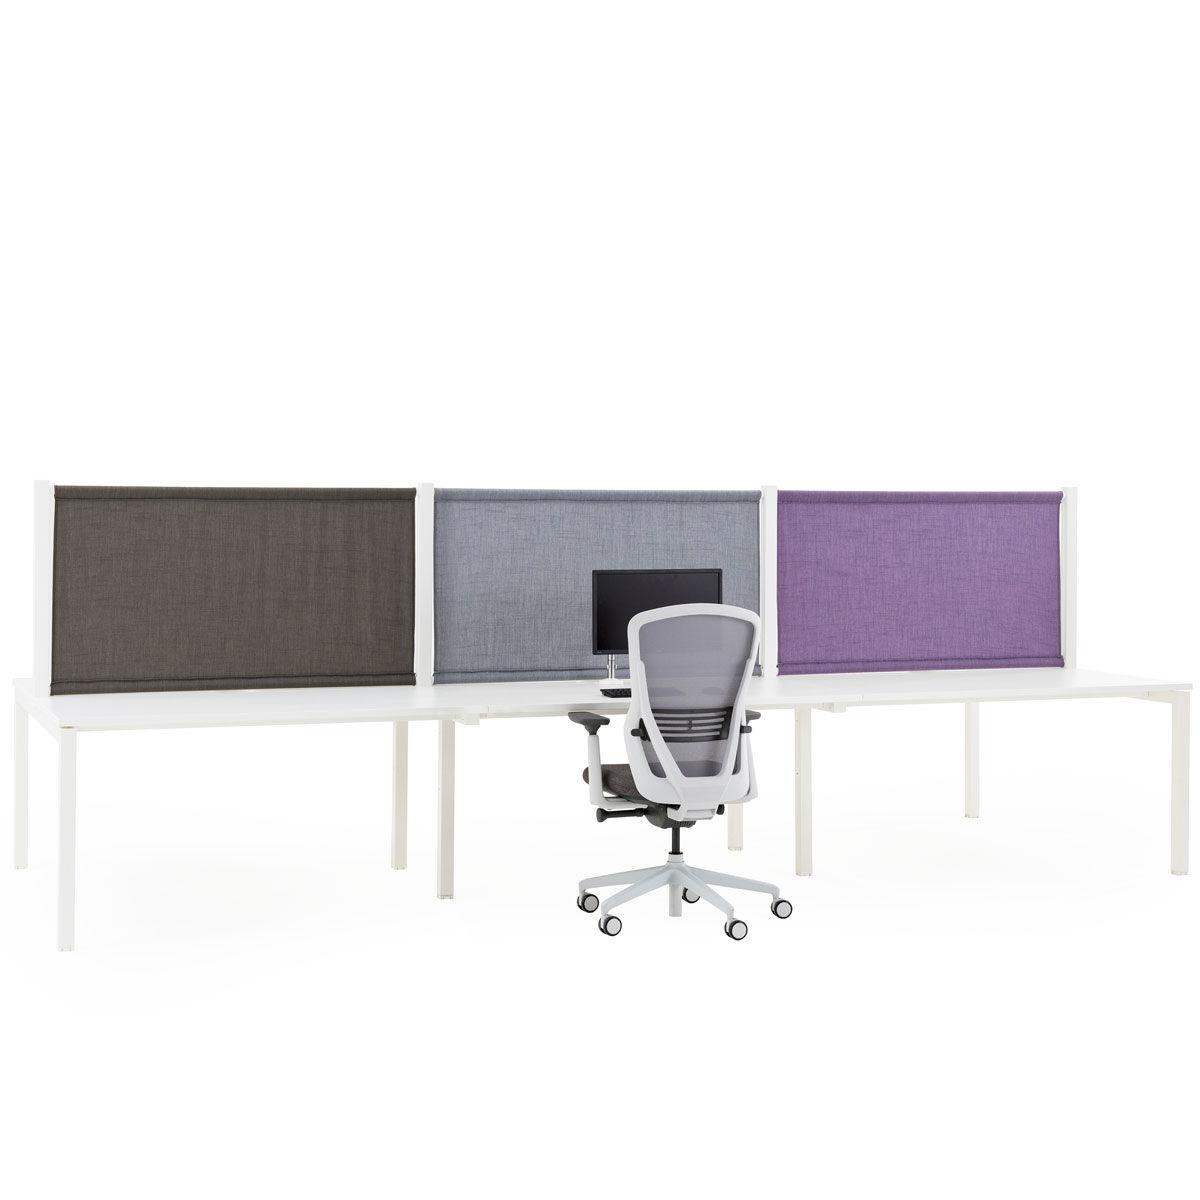 Fabric Gantry Screens